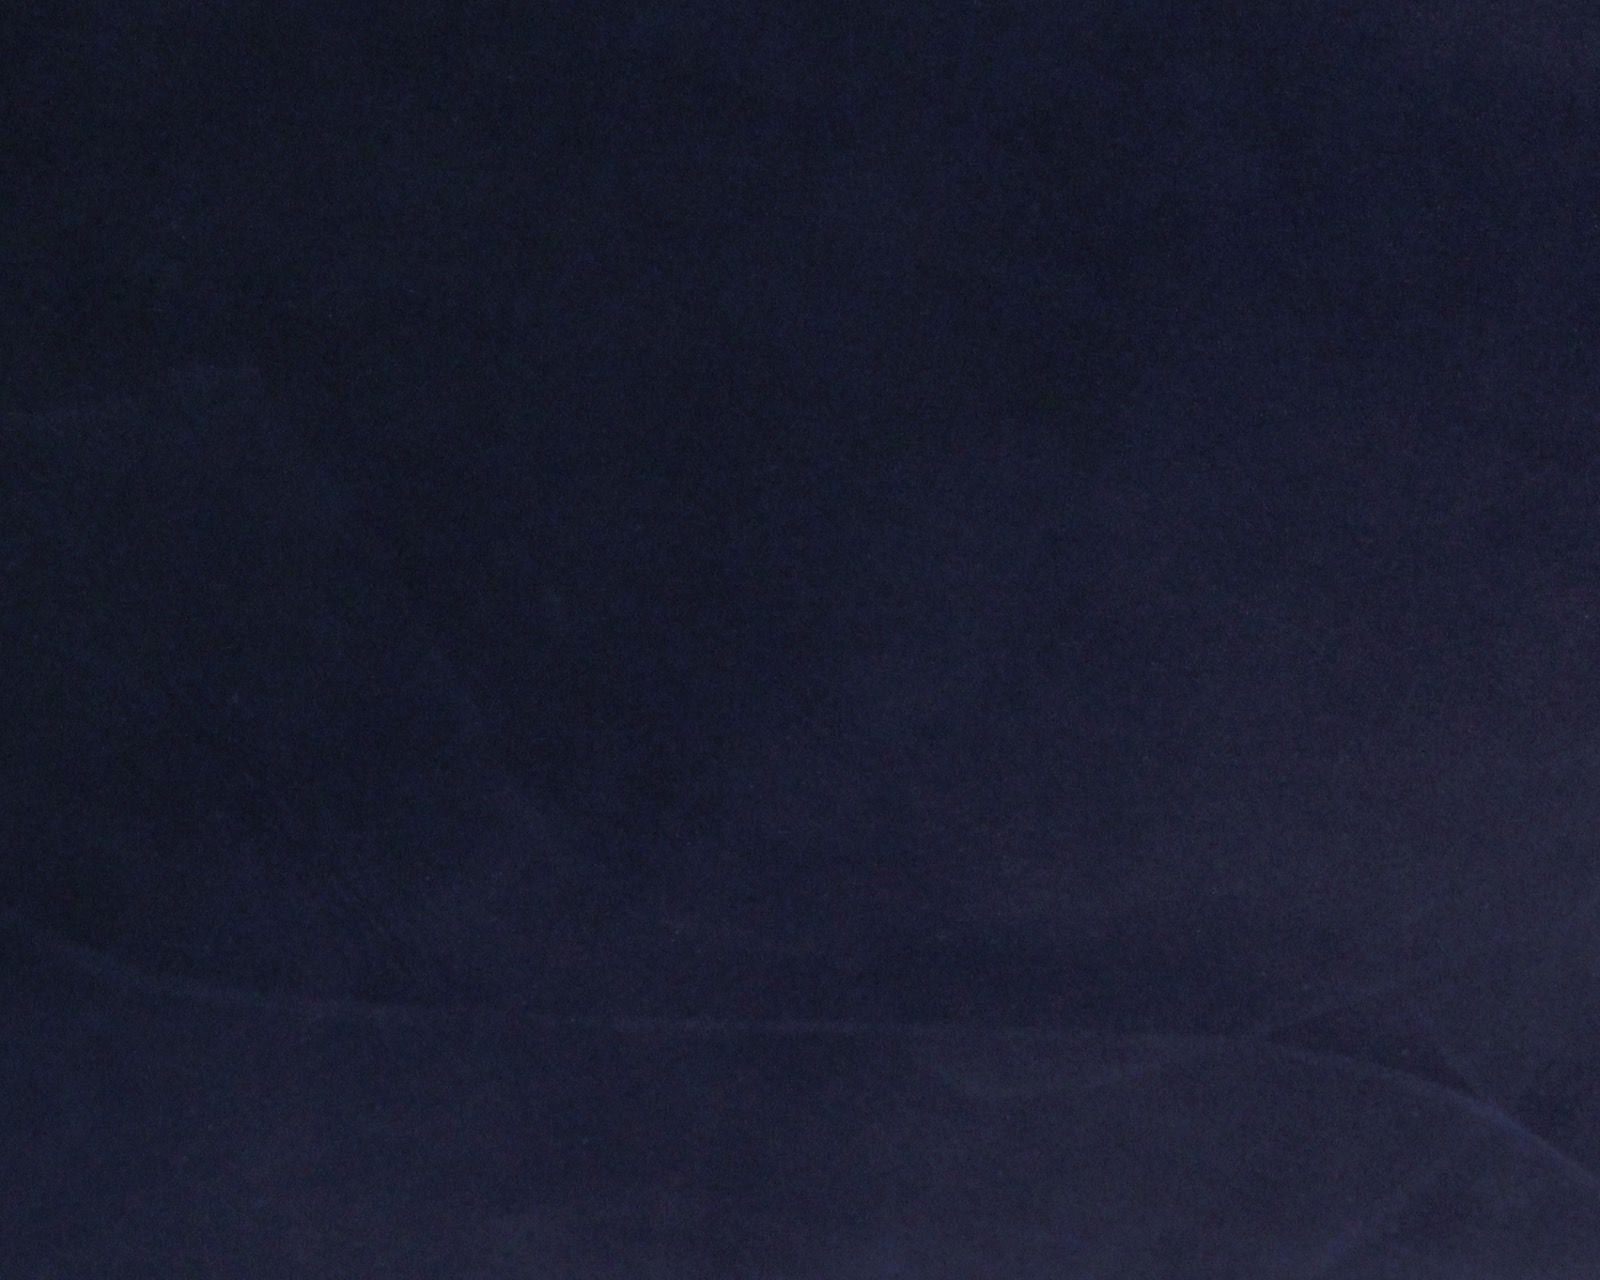 Dark Blue Nubuck